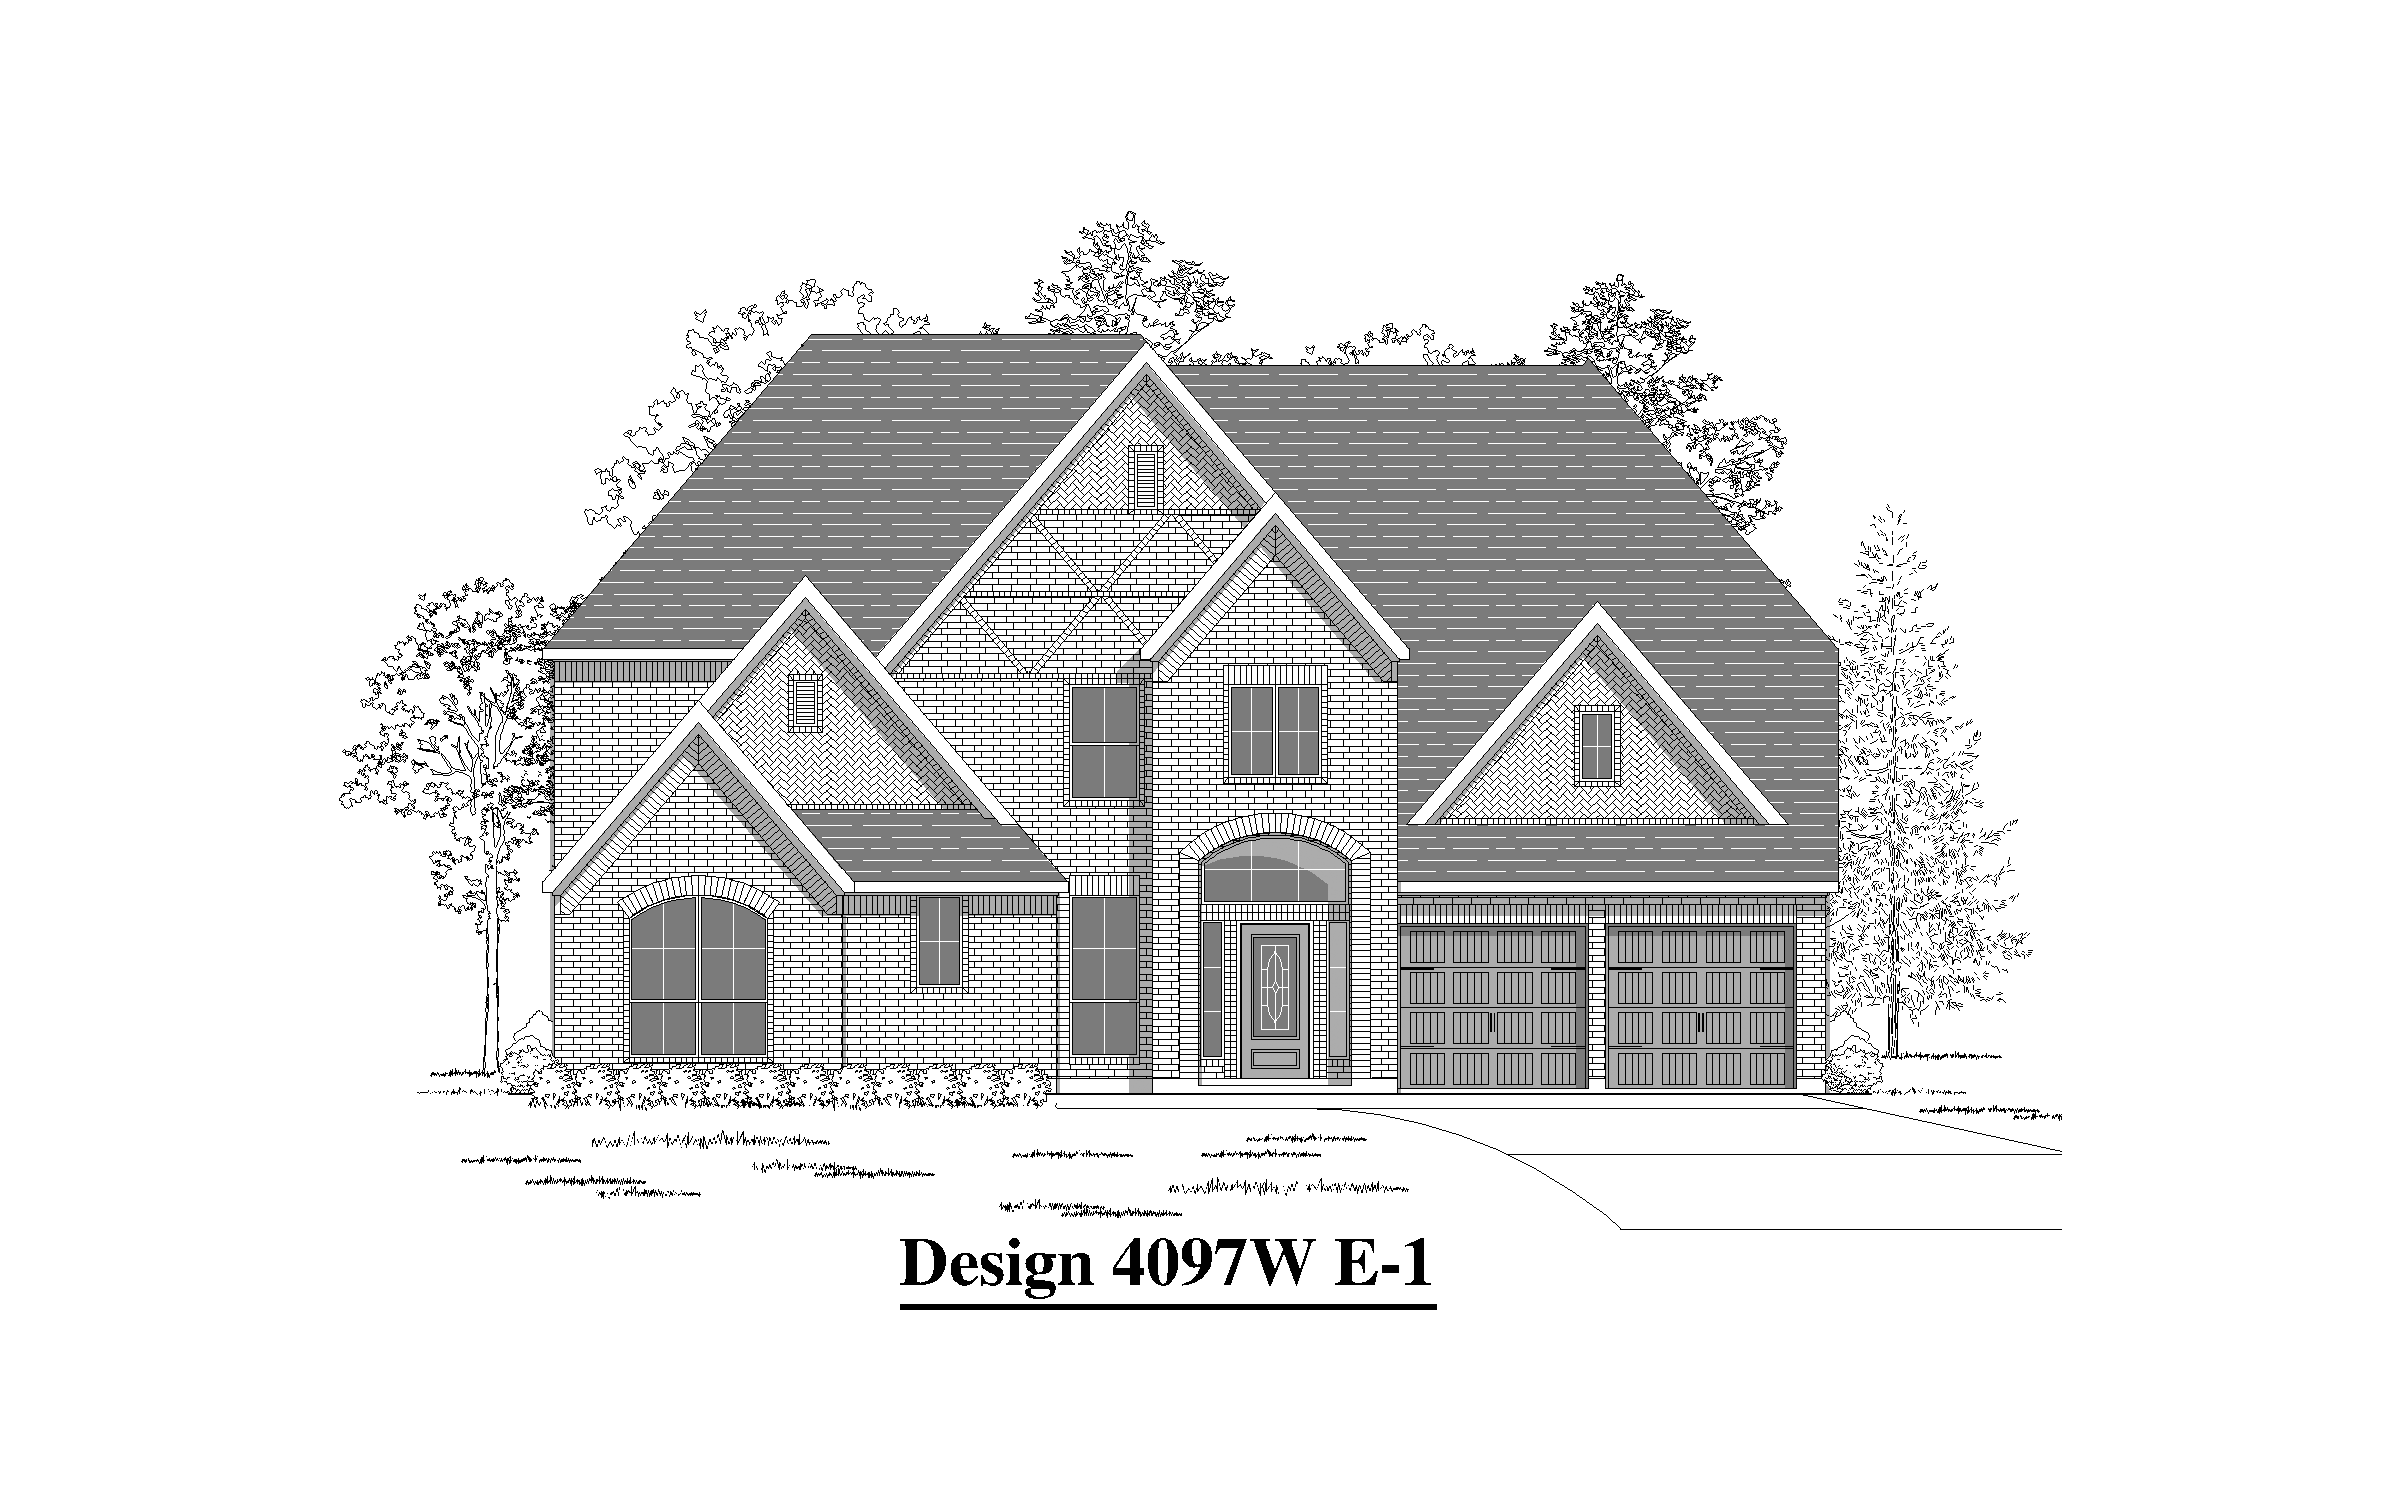 Single Family for Sale at Veranda 65' - 4097w 1242 Mystic River Lane Rosenberg, Texas 77471 United States